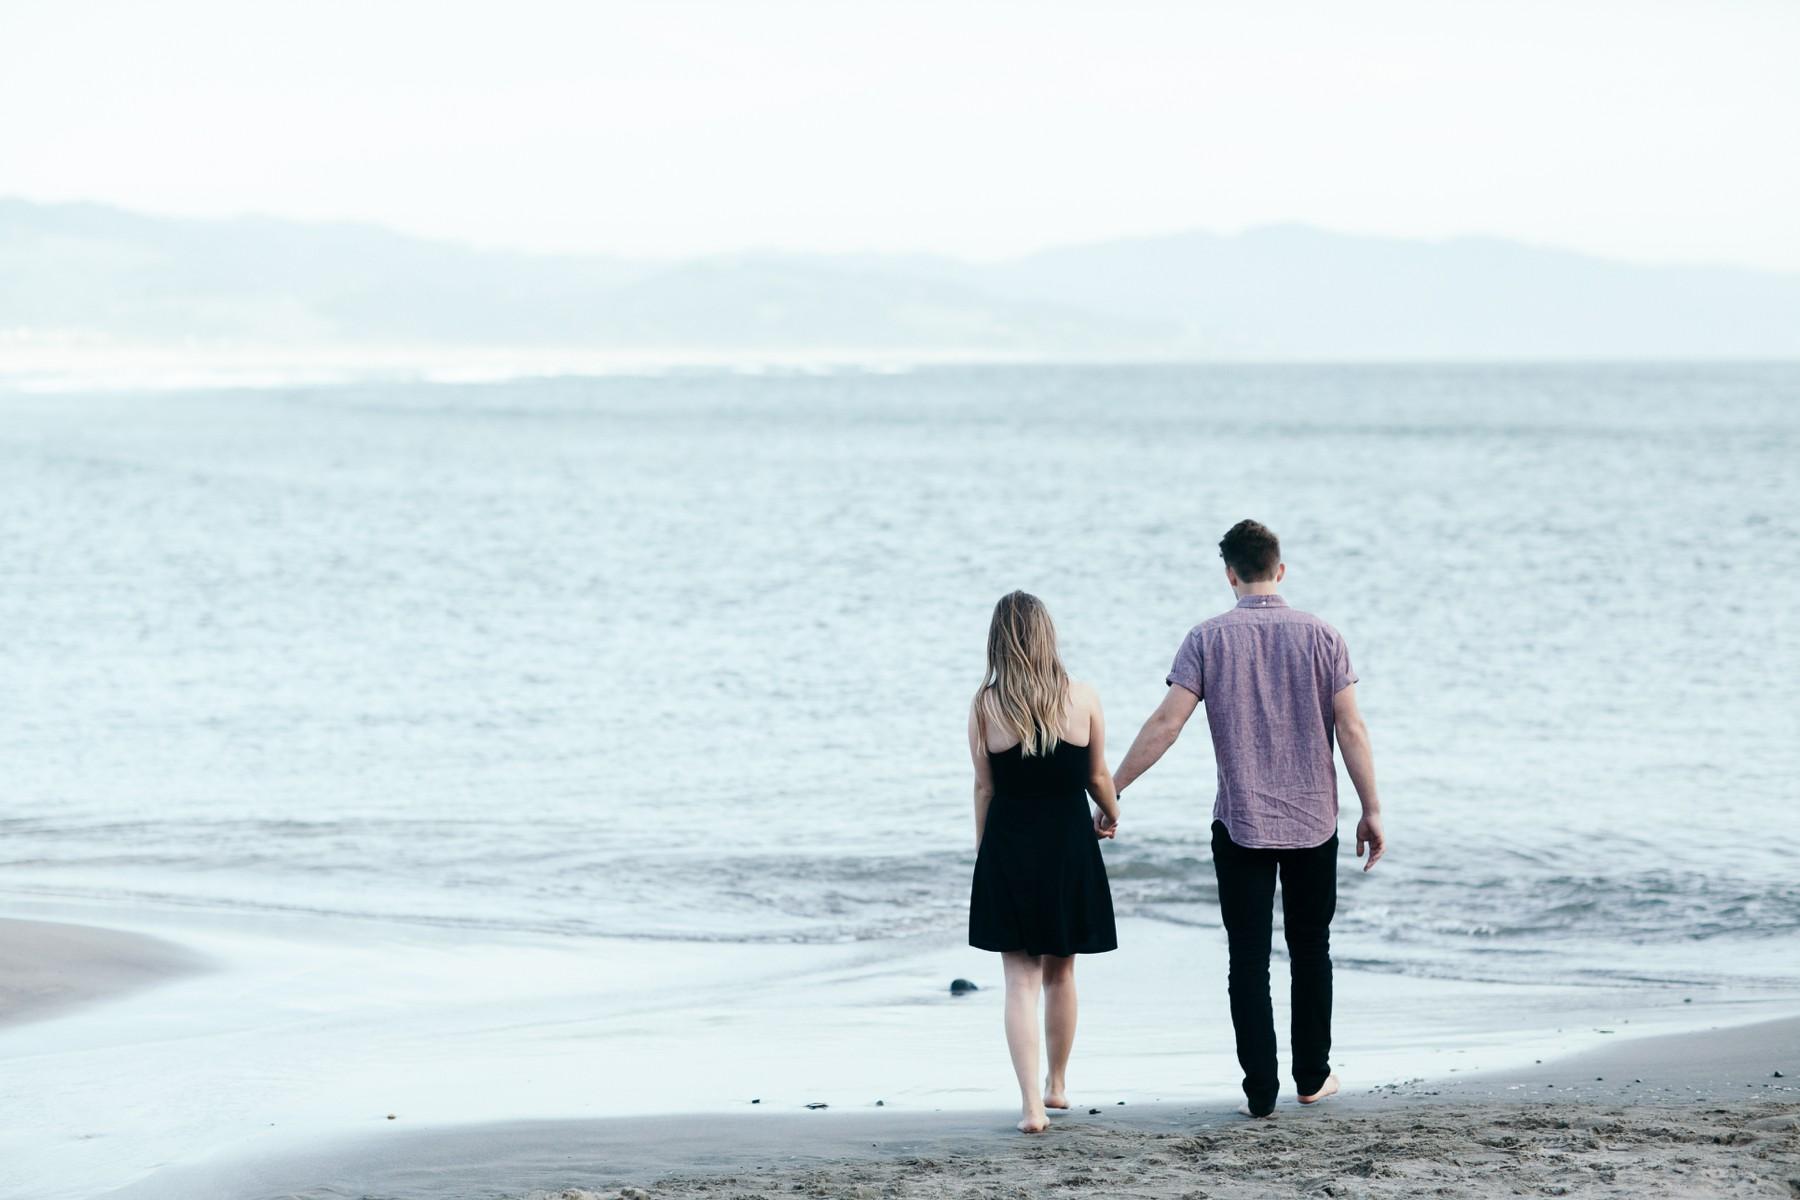 Oregon-Coast-Proposal-Photographs-Jenna-and-Josh-46.jpg